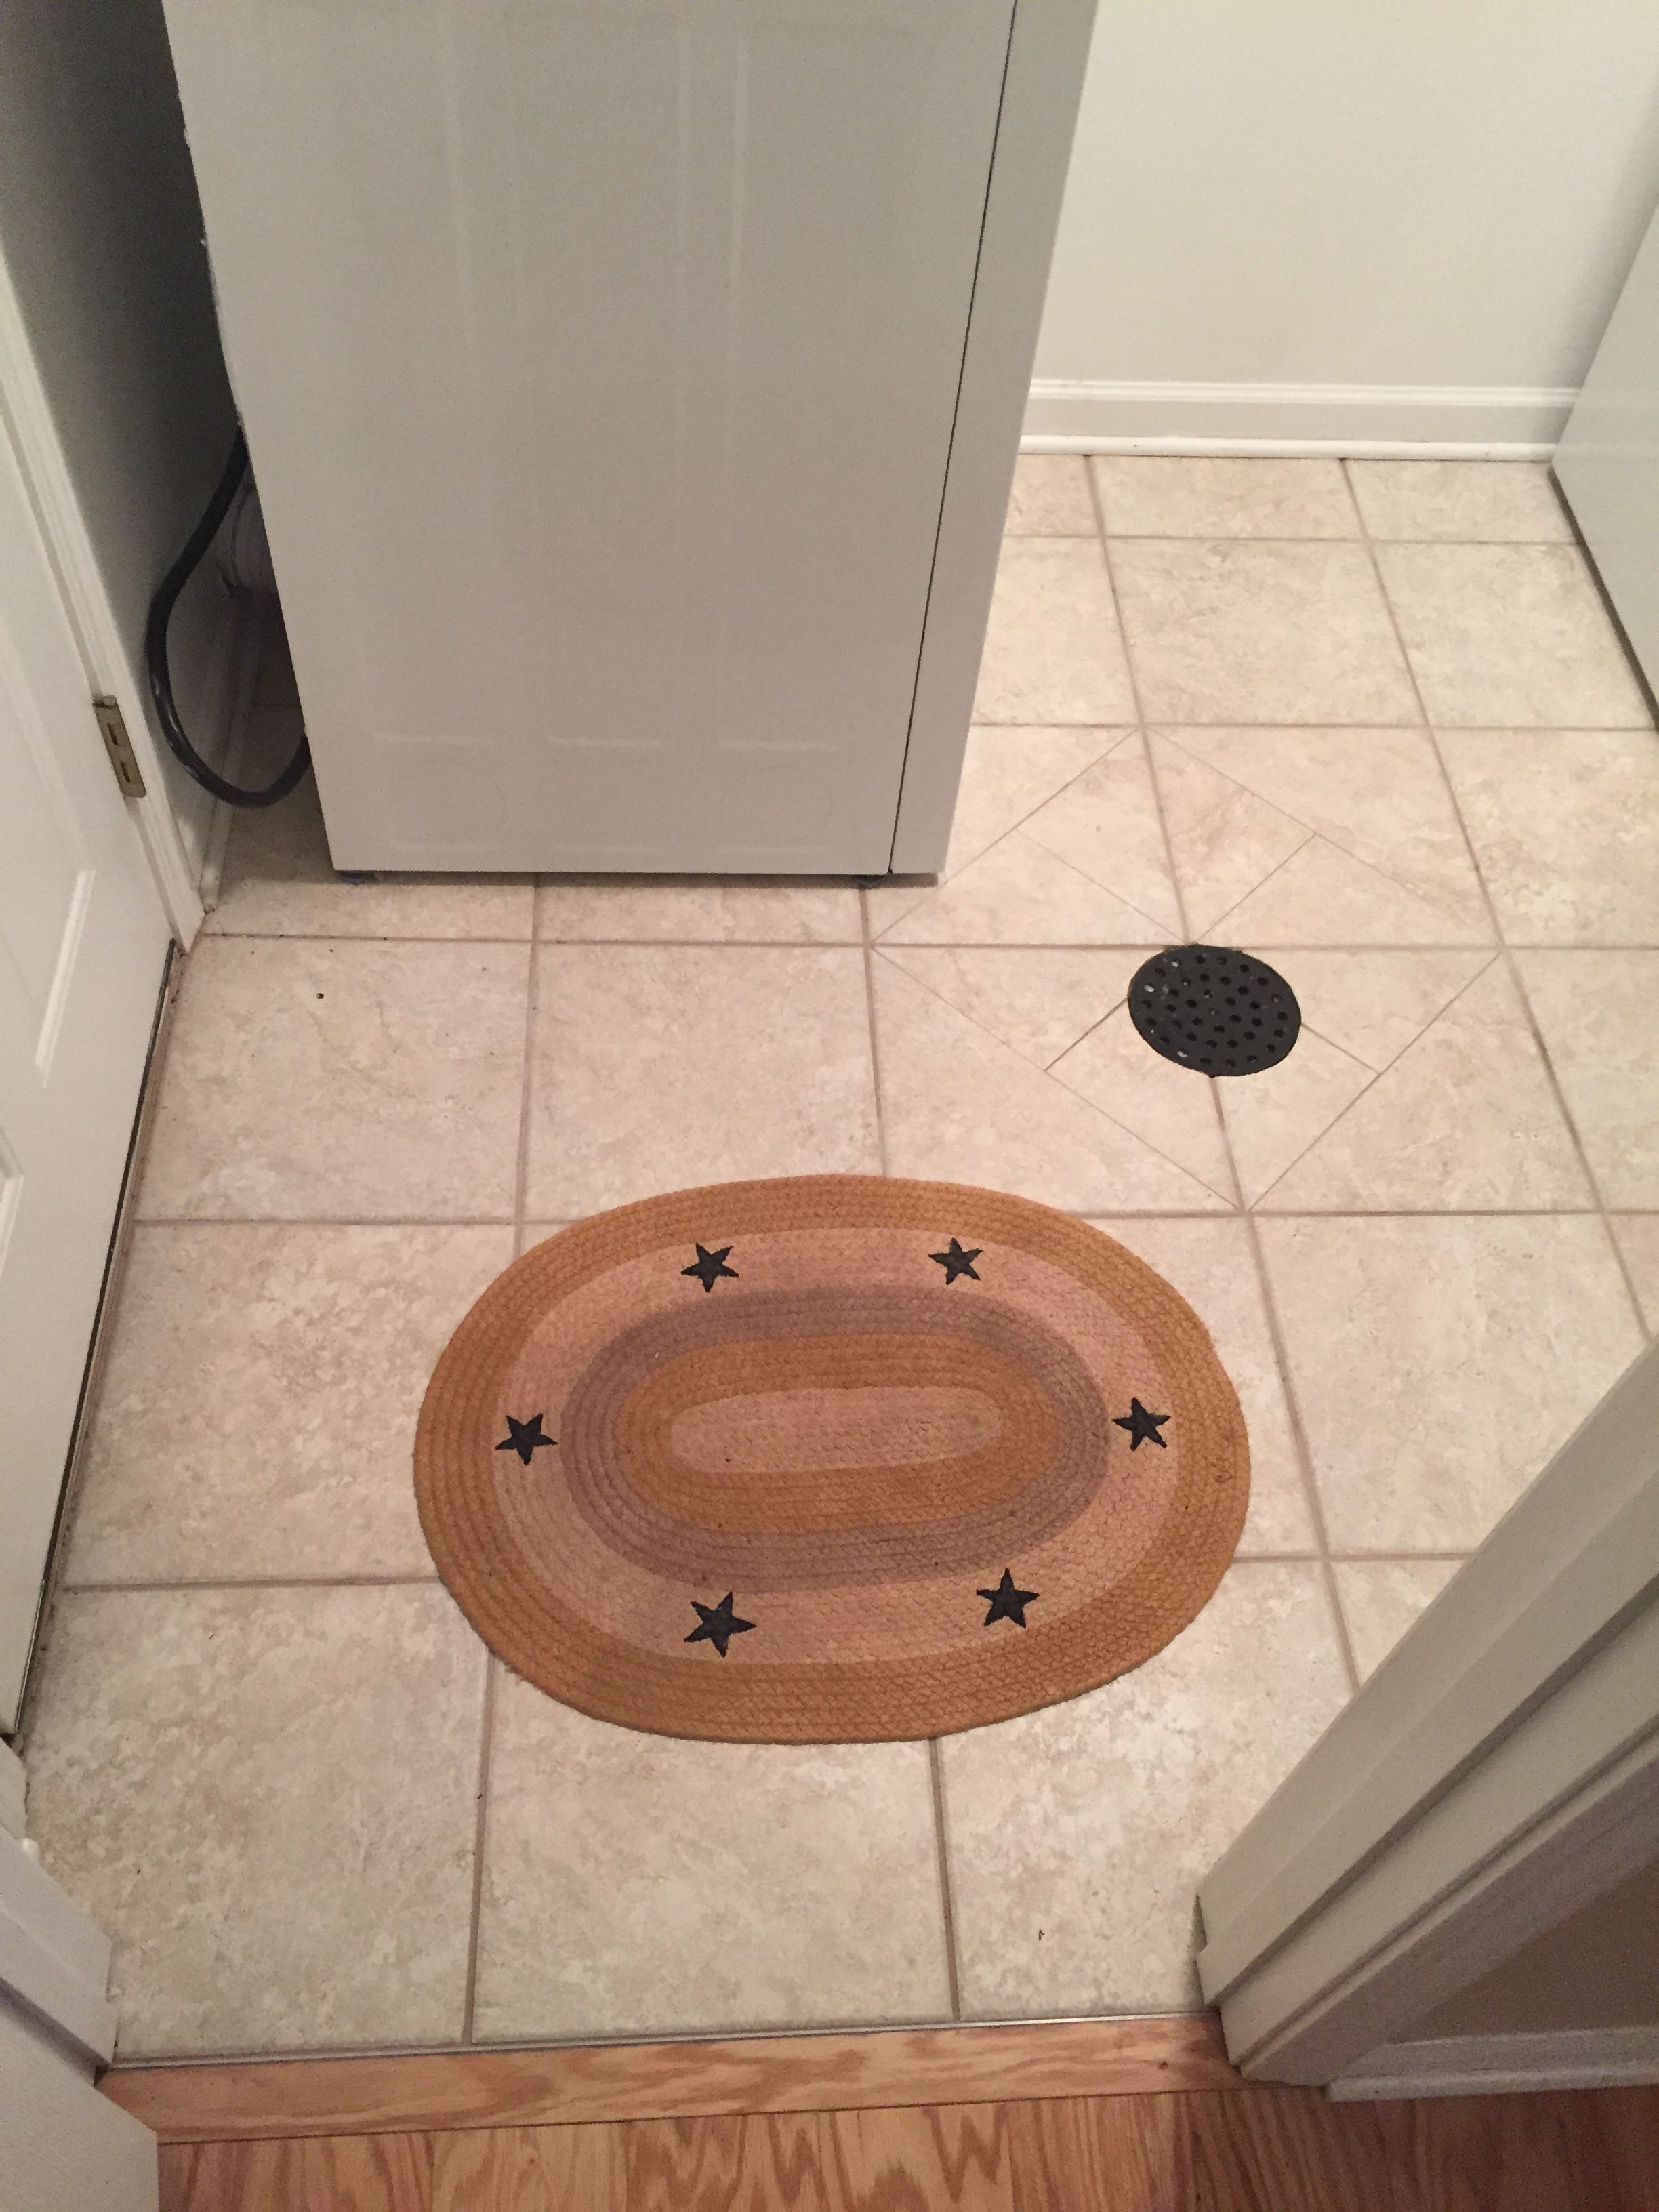 Tile Mud Room With Floor Drain